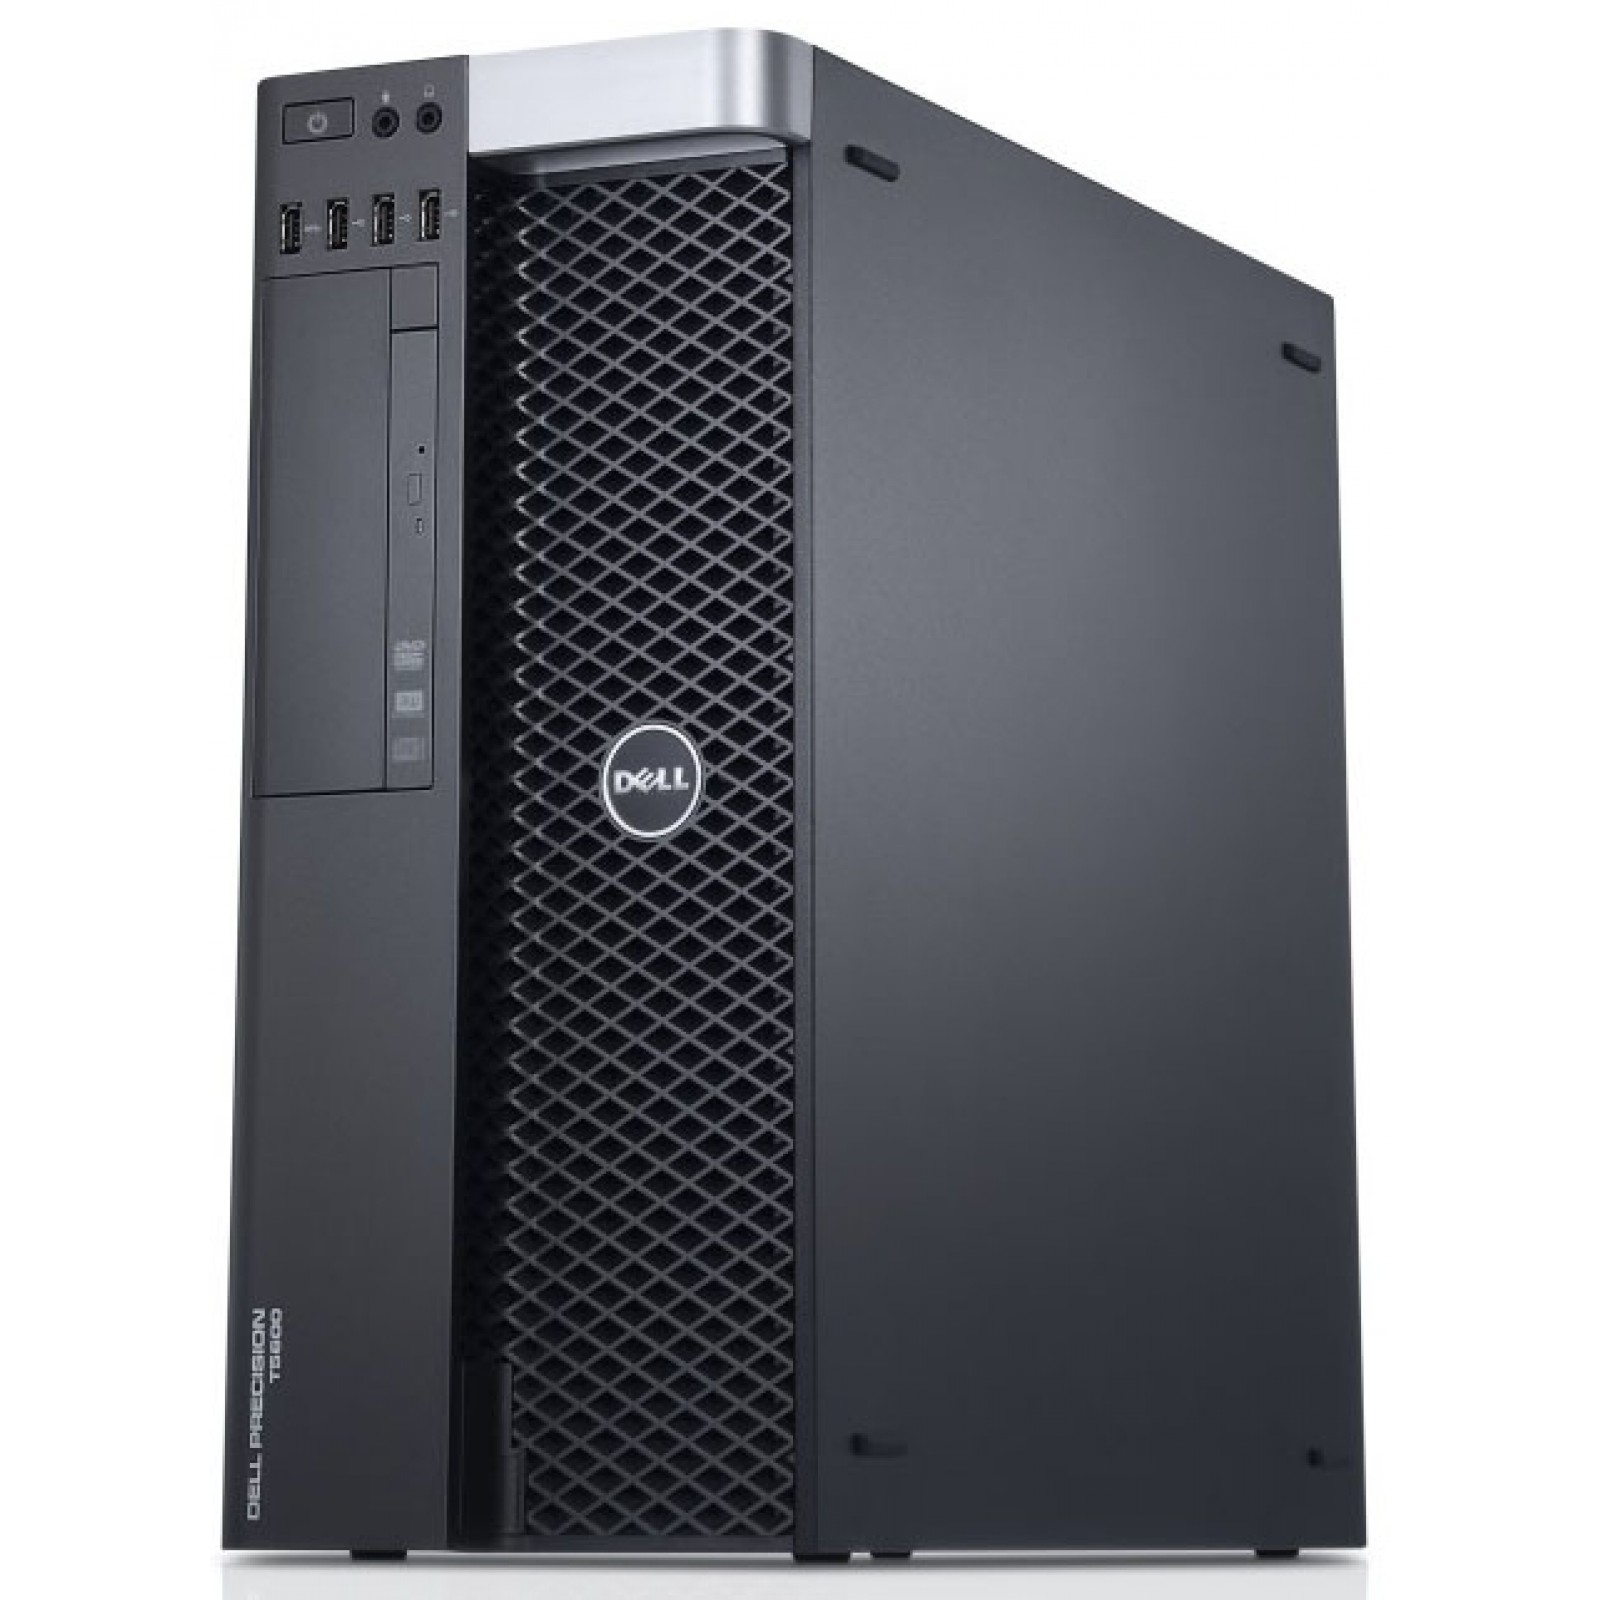 دسکتاپ Dell مدل T5600 WorkStation A